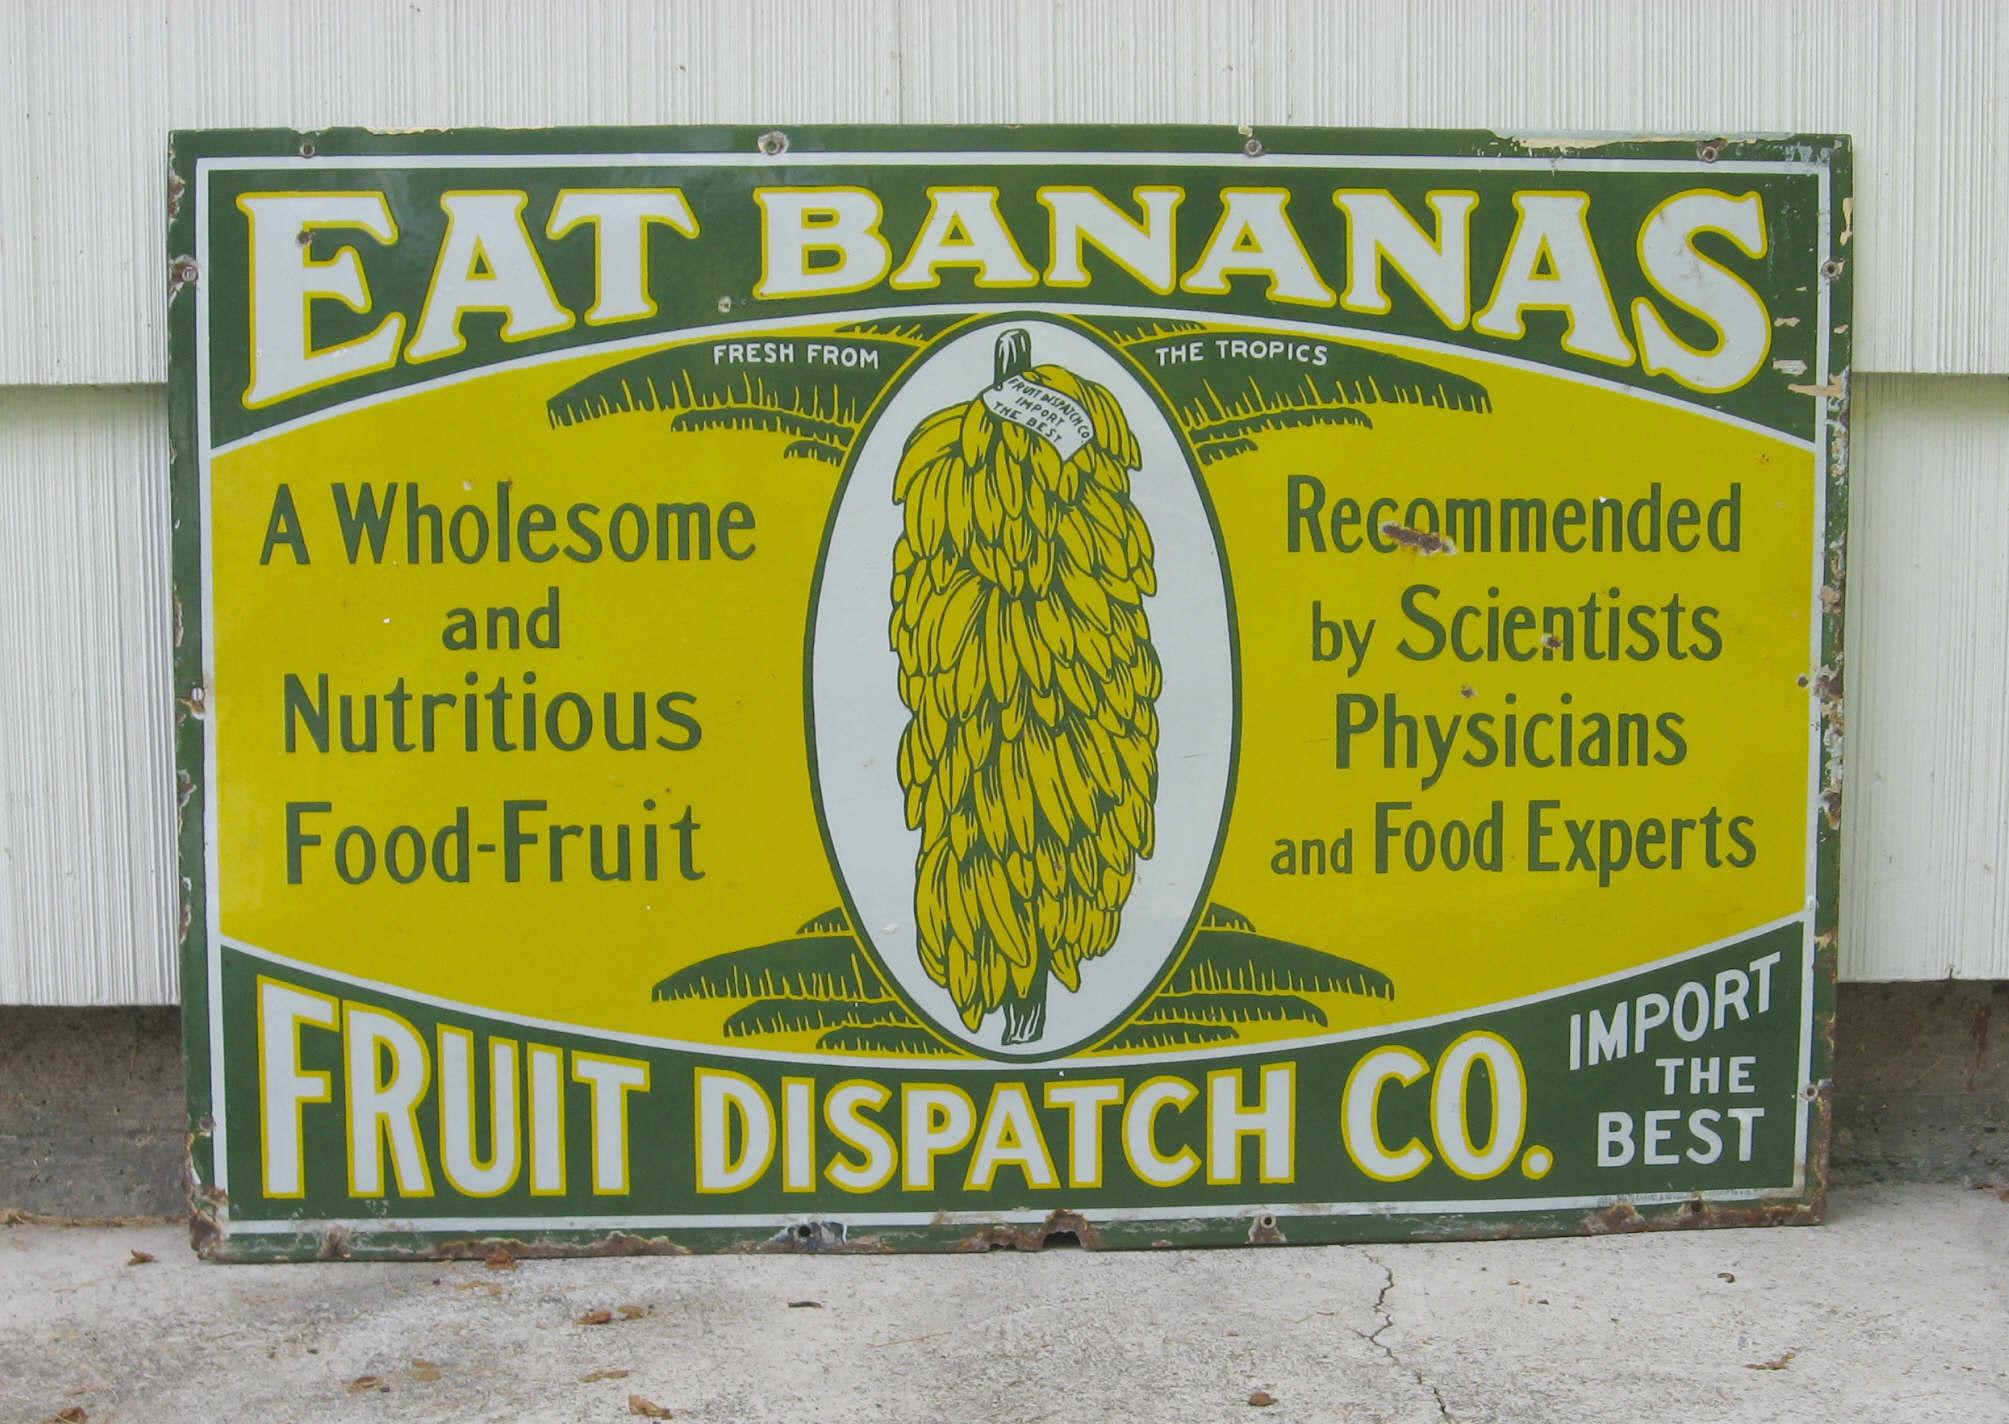 fruitdispatch